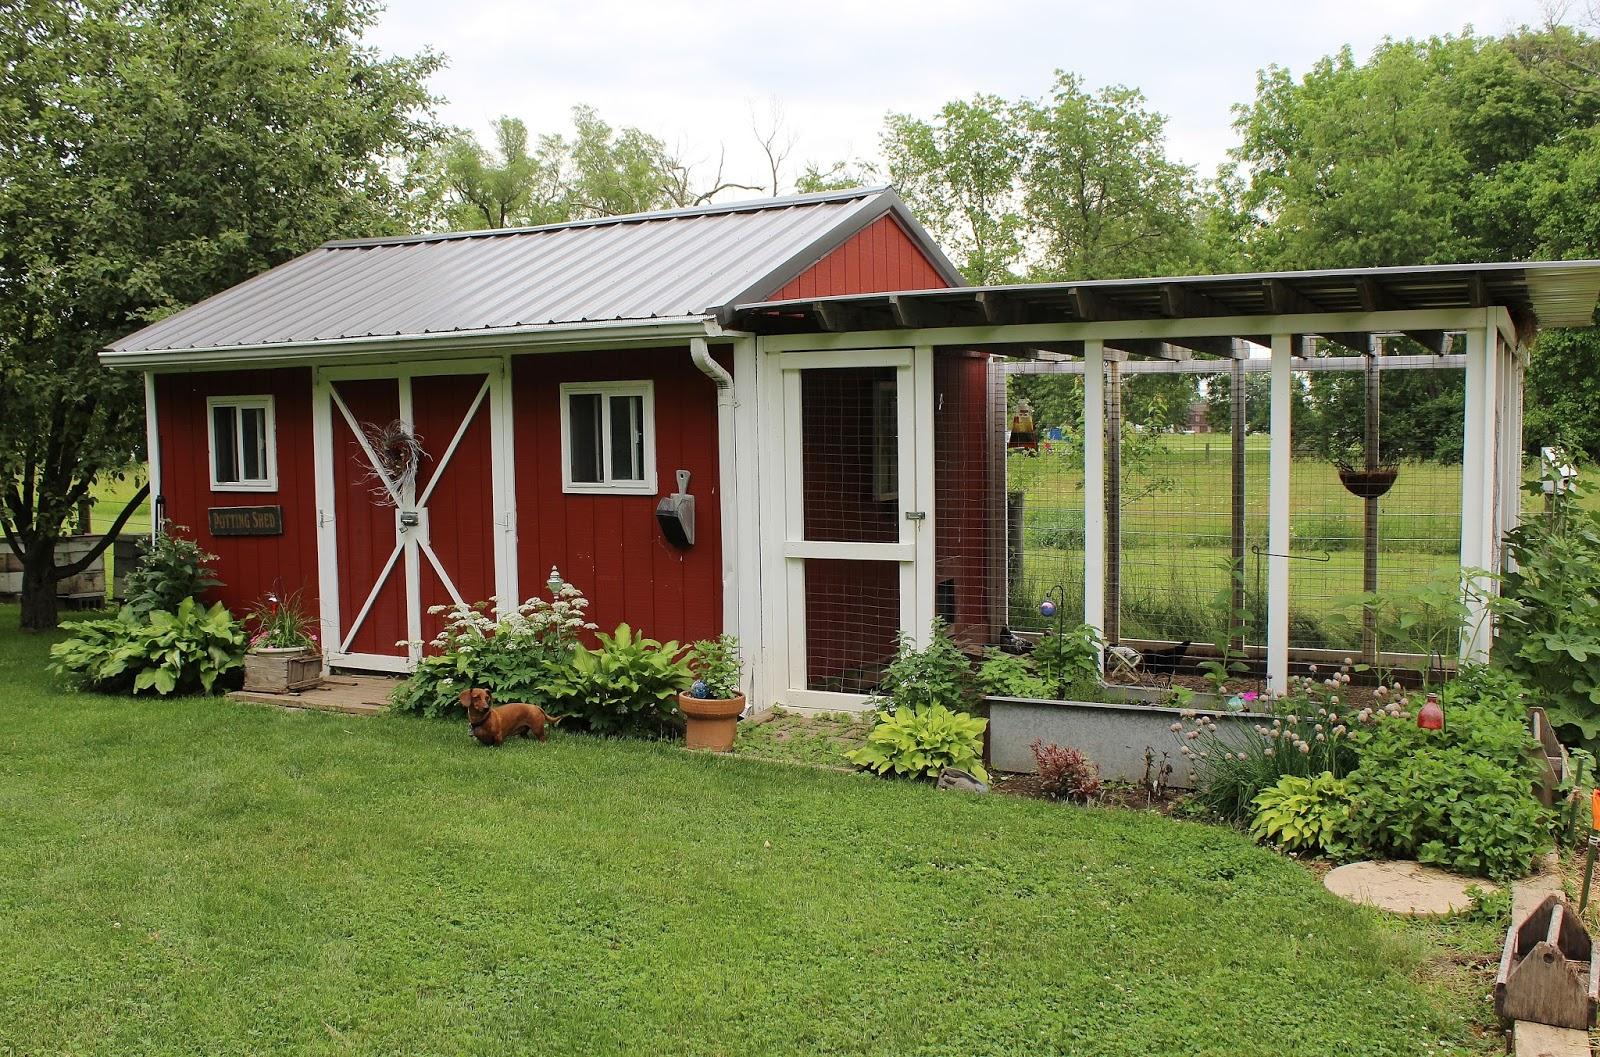 half gardening shed and half chicken coop with attached scratch yard near my vegetable garden